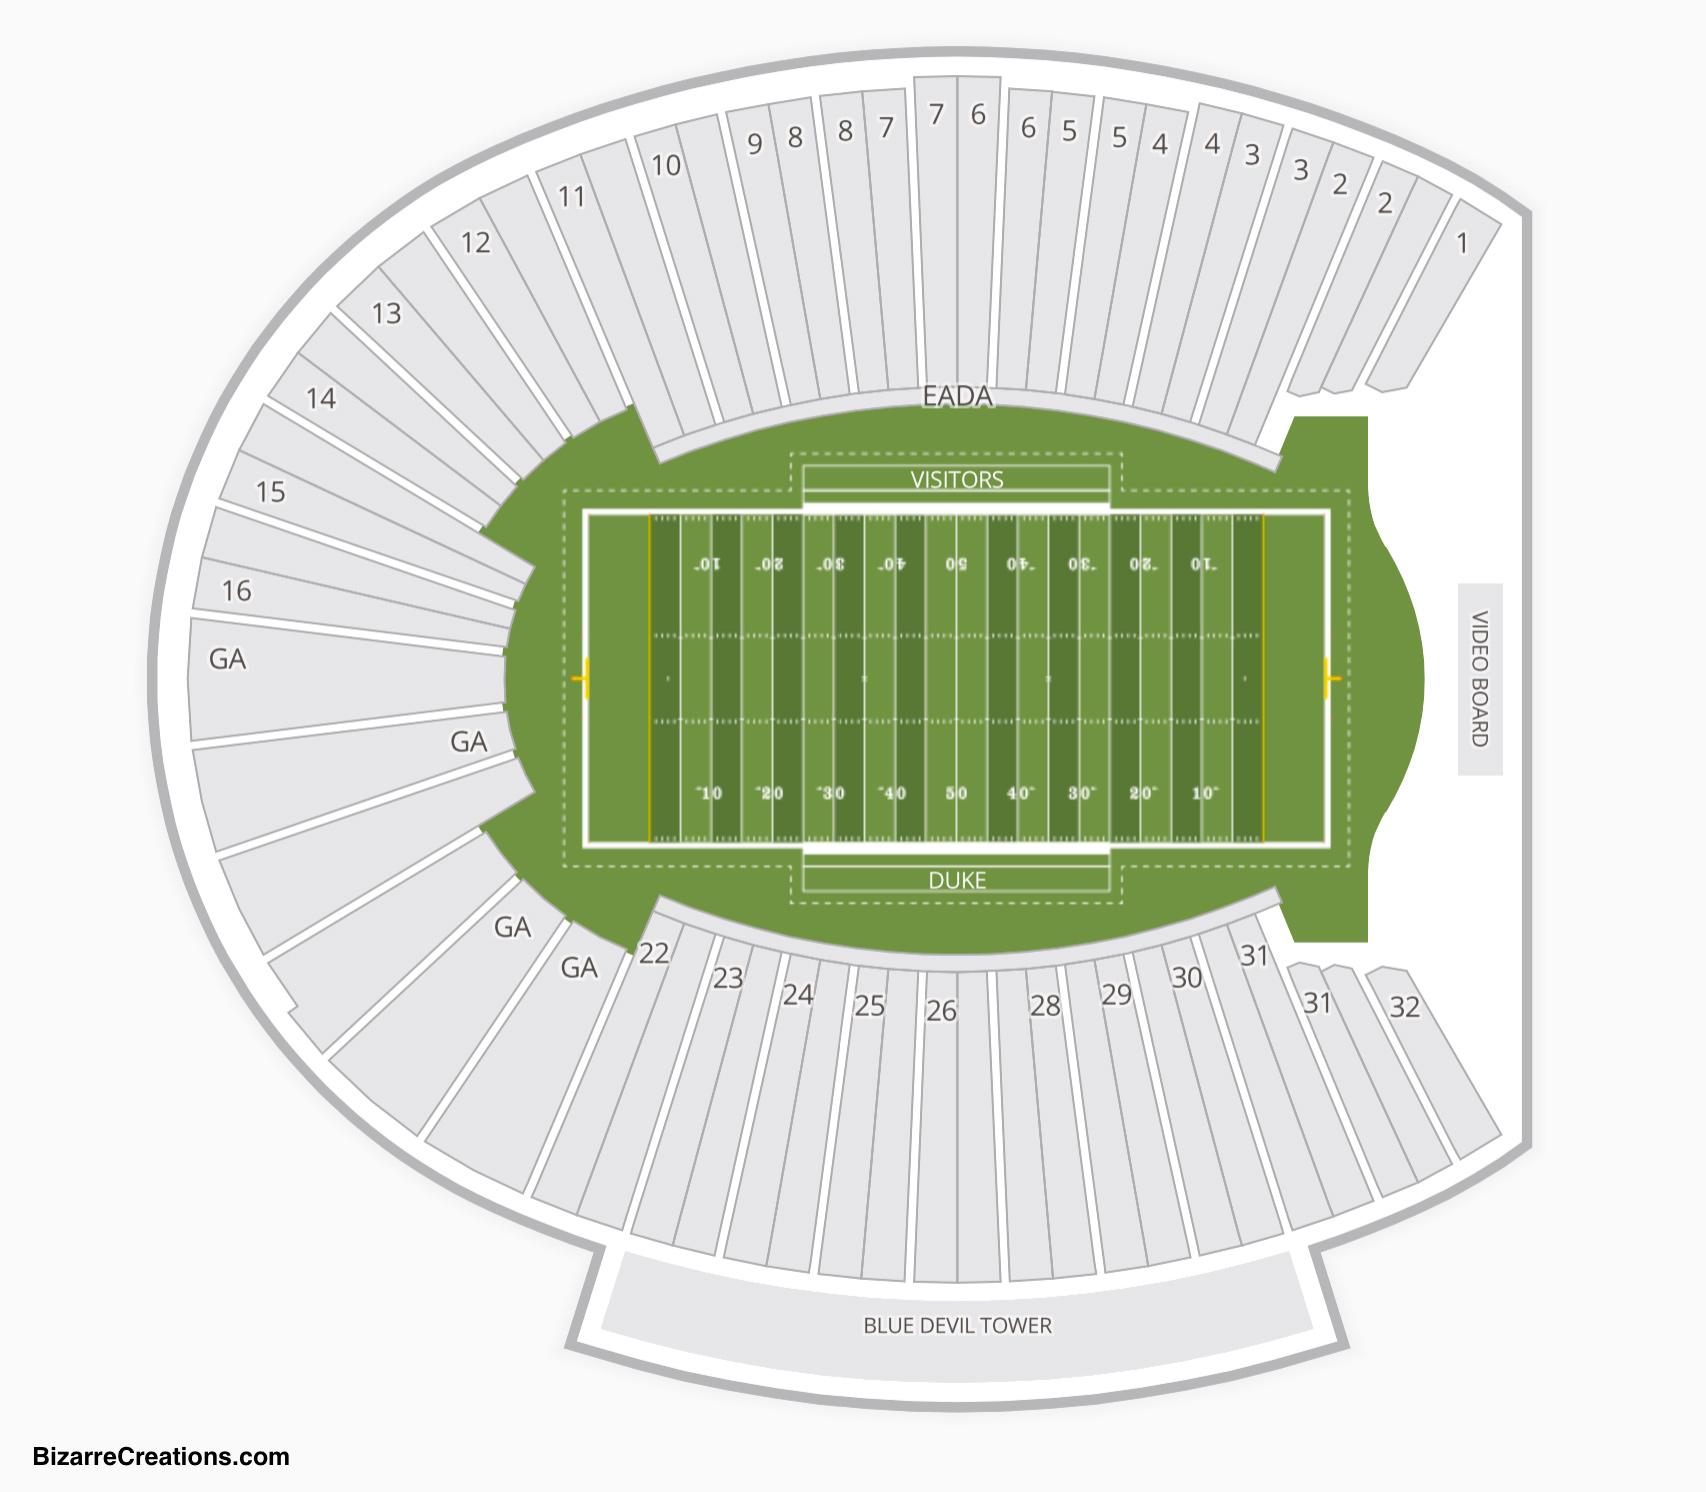 Wallace Wade Stadium Seating Chart Seating Charts Tickets